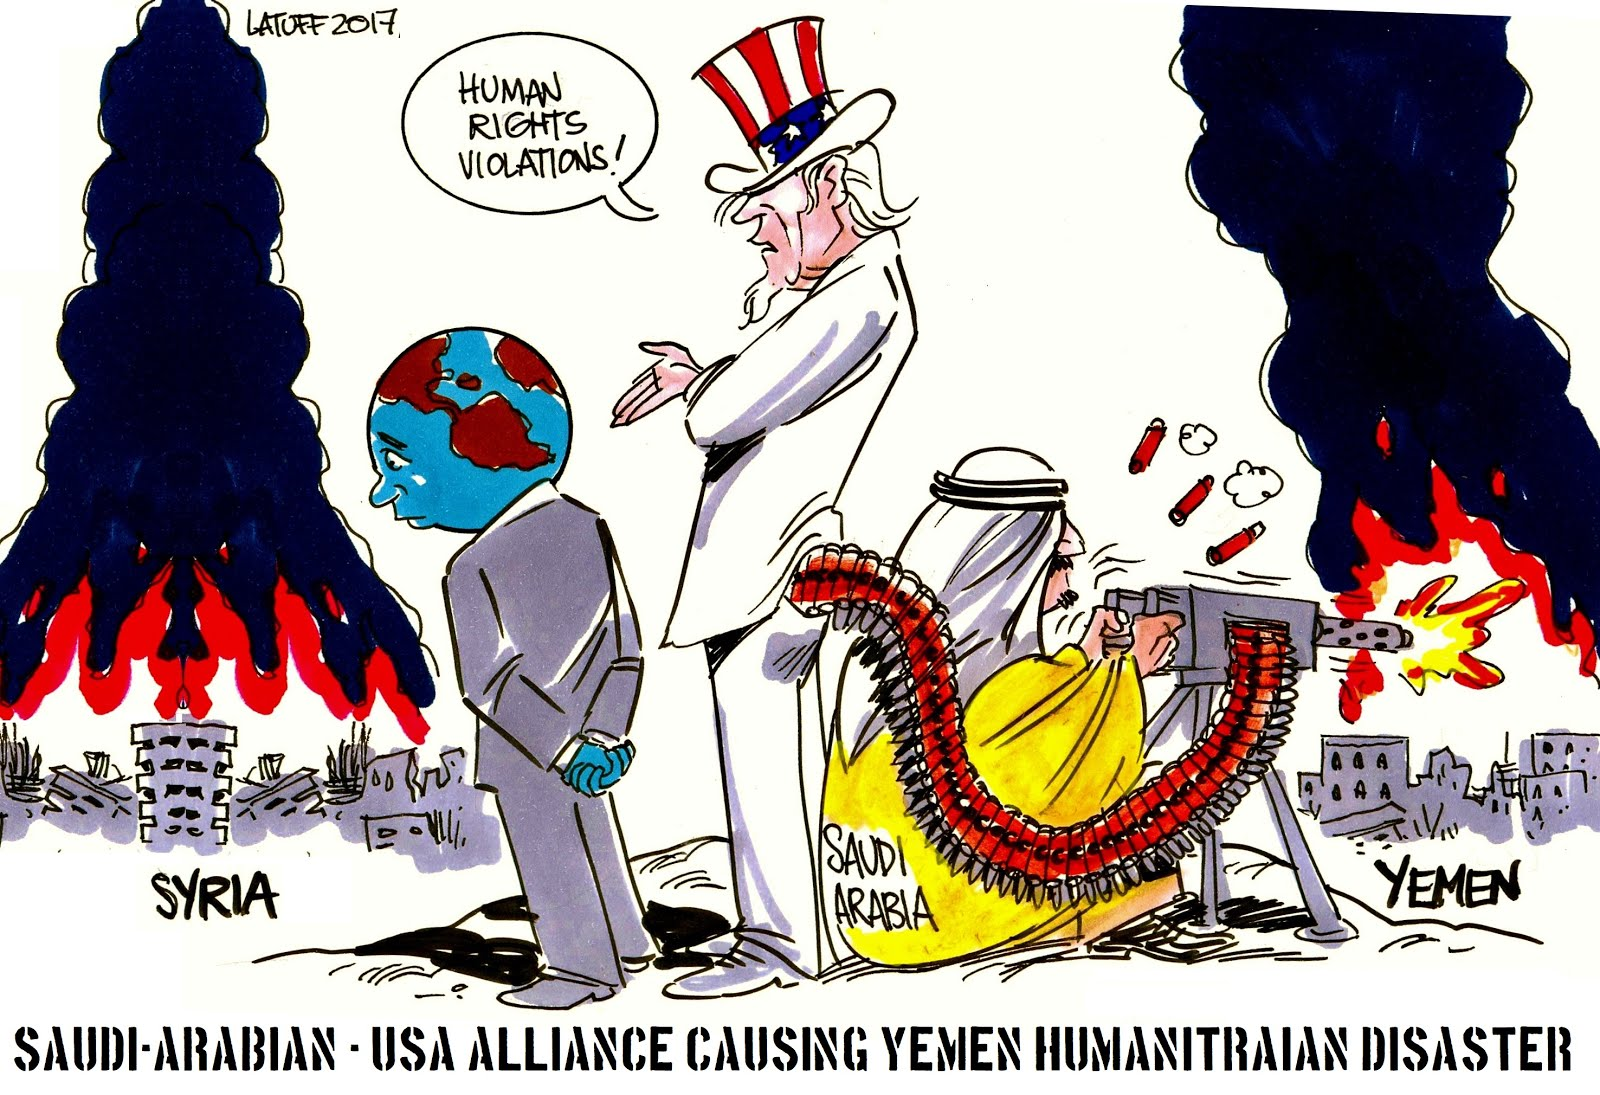 Yemen Human Rights Violations Happening!